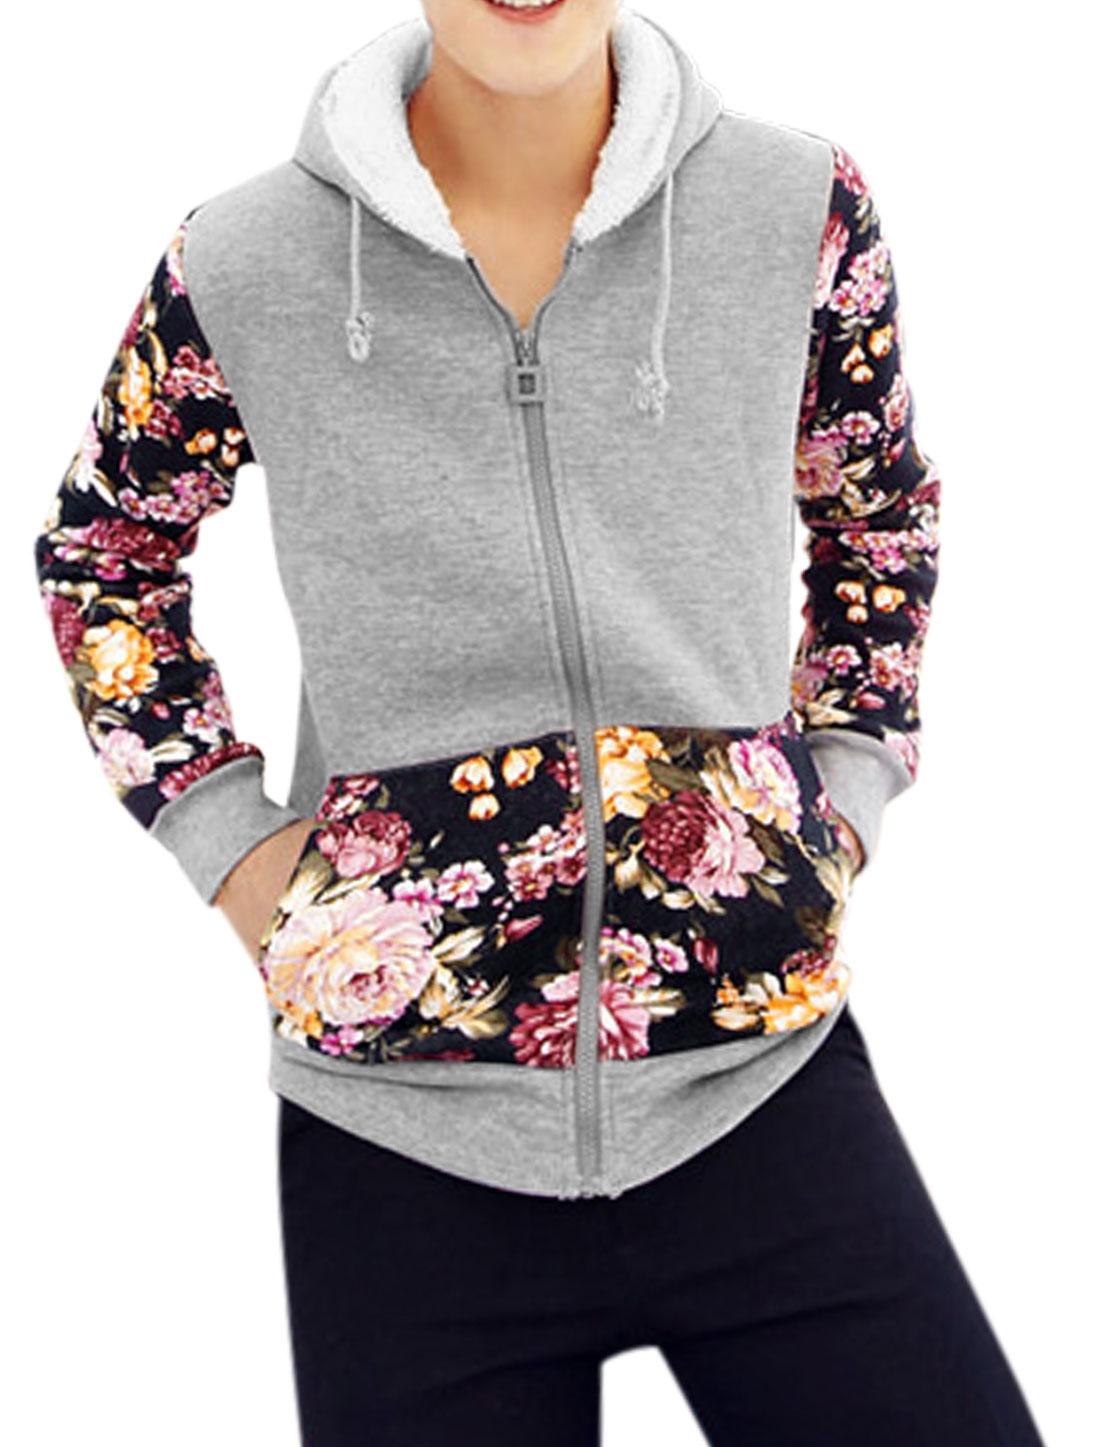 Men Floral Pattern Long Sleeve Zipper Closure Leisure Hoodie Light Gray M